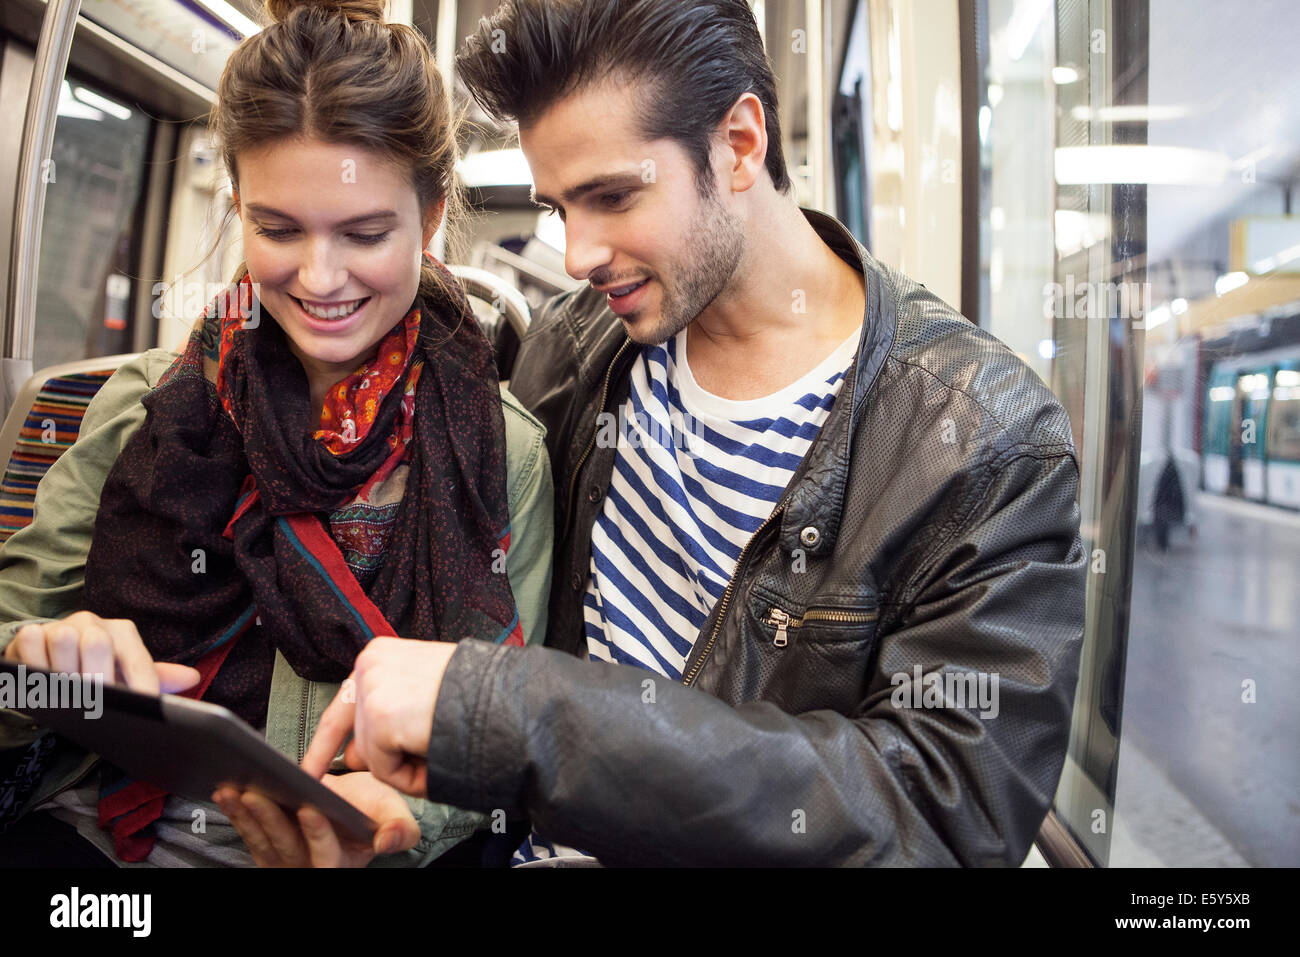 Junges Paar Reiten u digital-Tablette zusammen betrachten Stockbild